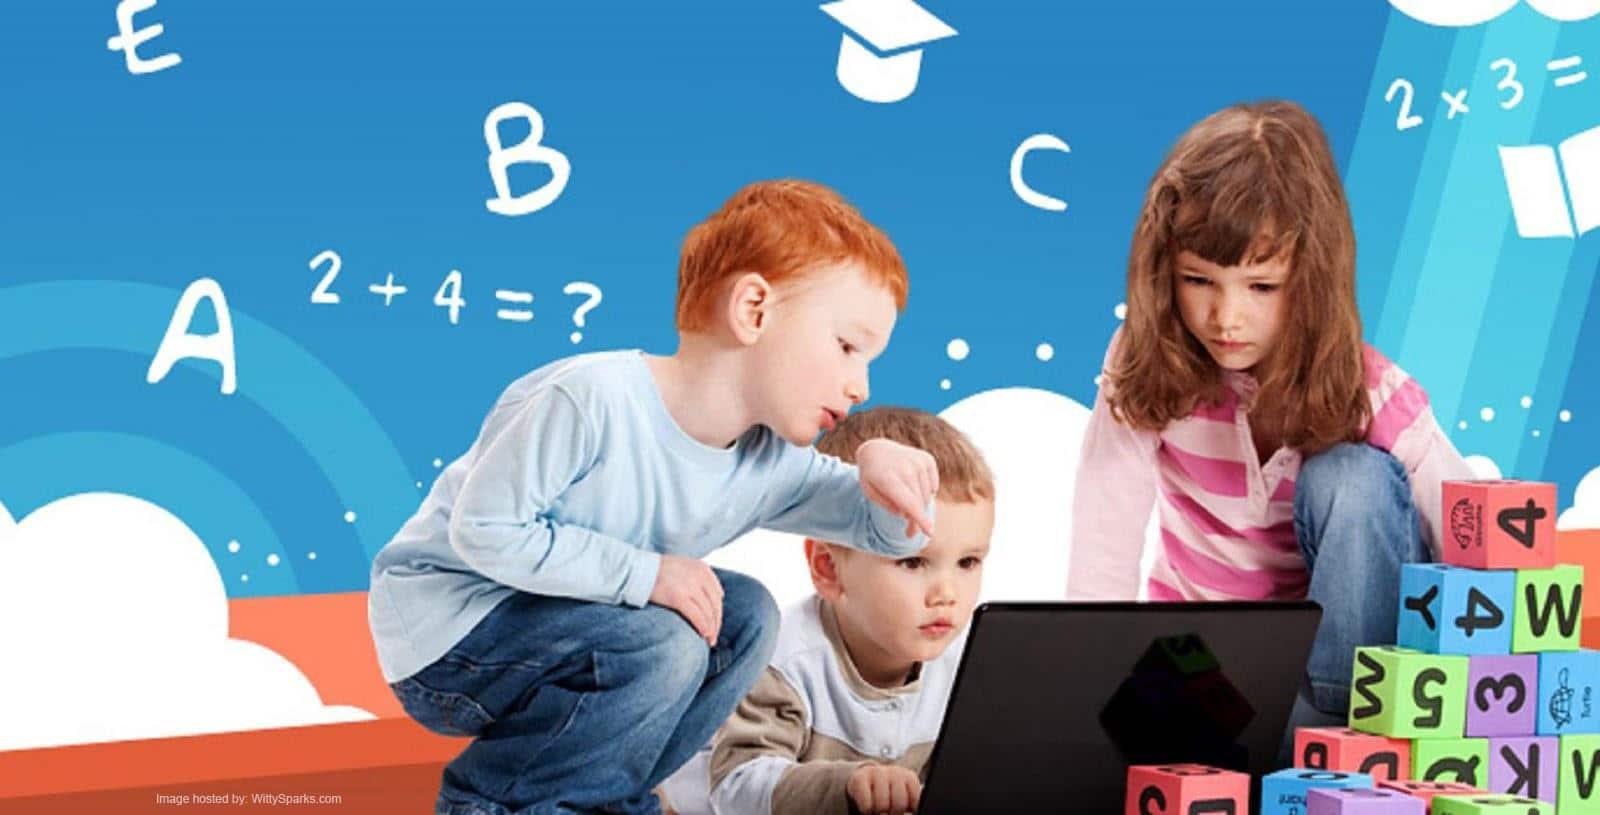 Children or Kids Game-Based Learning - Education